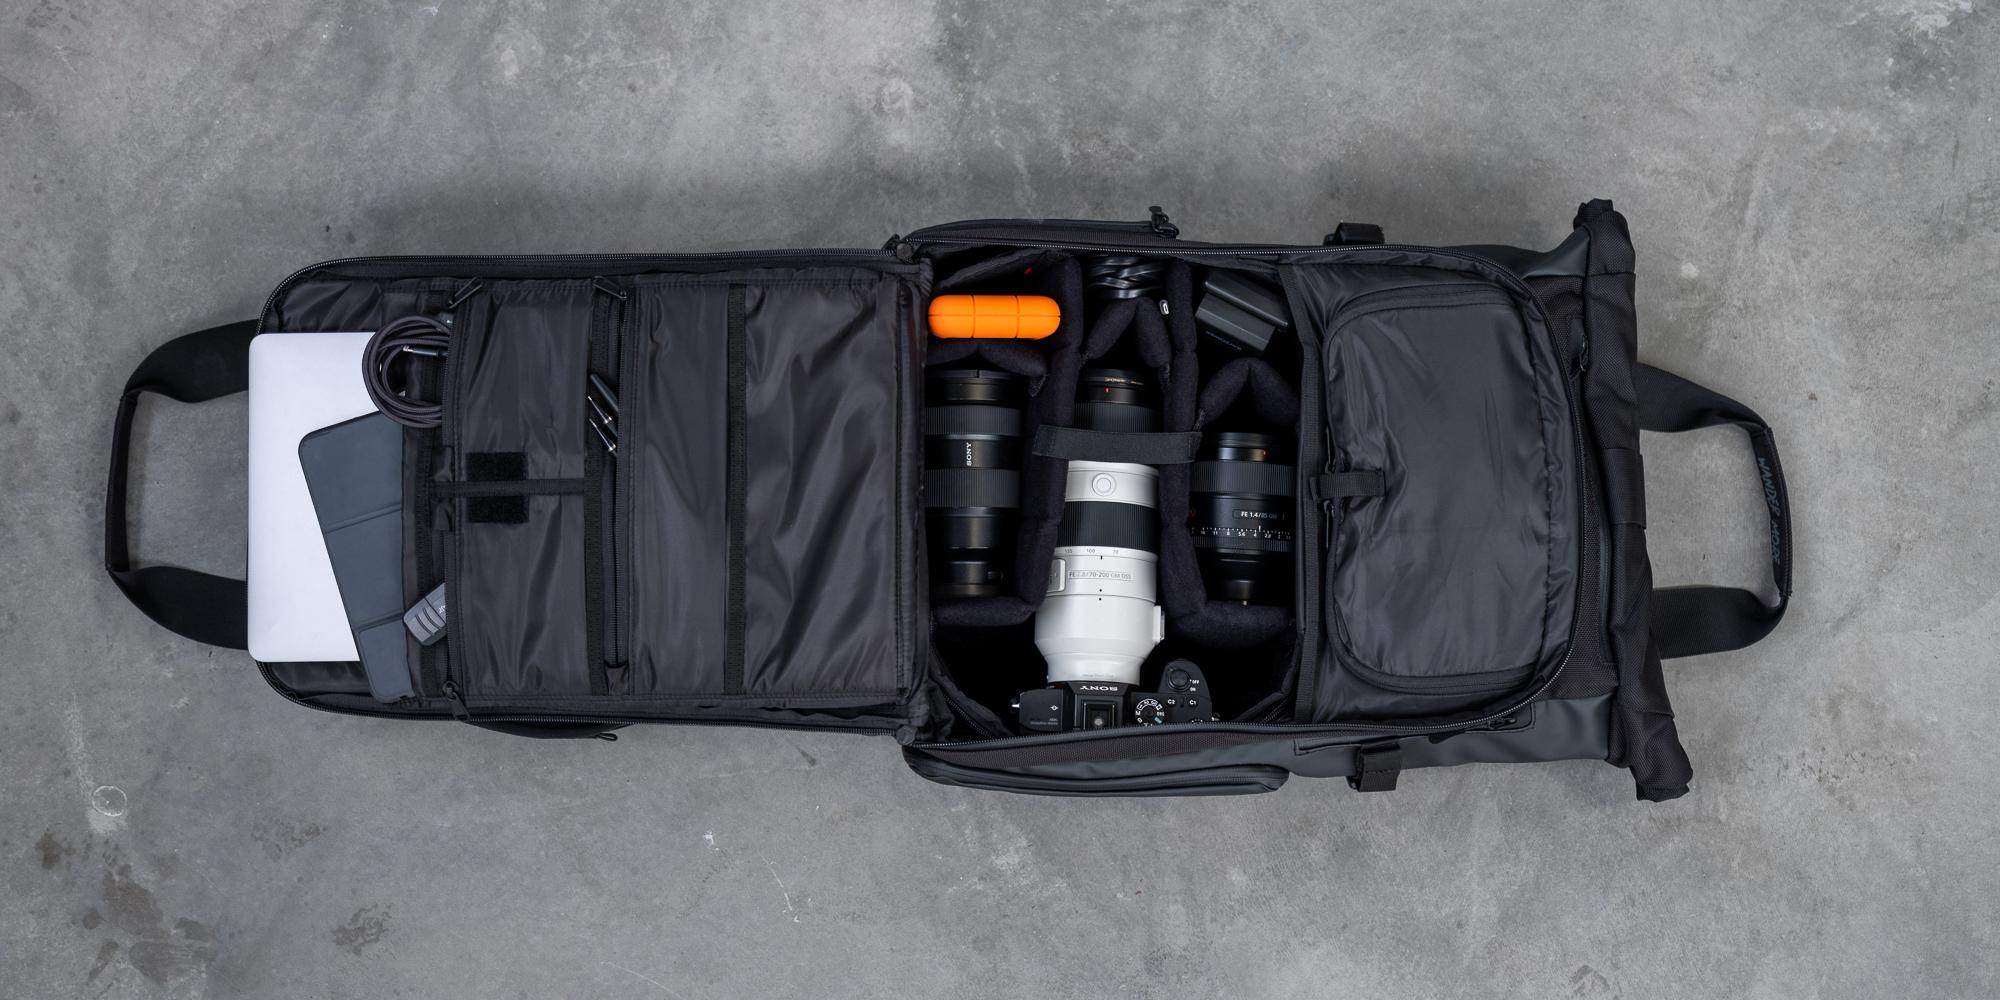 Wandrd All-new Prvke 31 Backpack - A Photographer's Essential